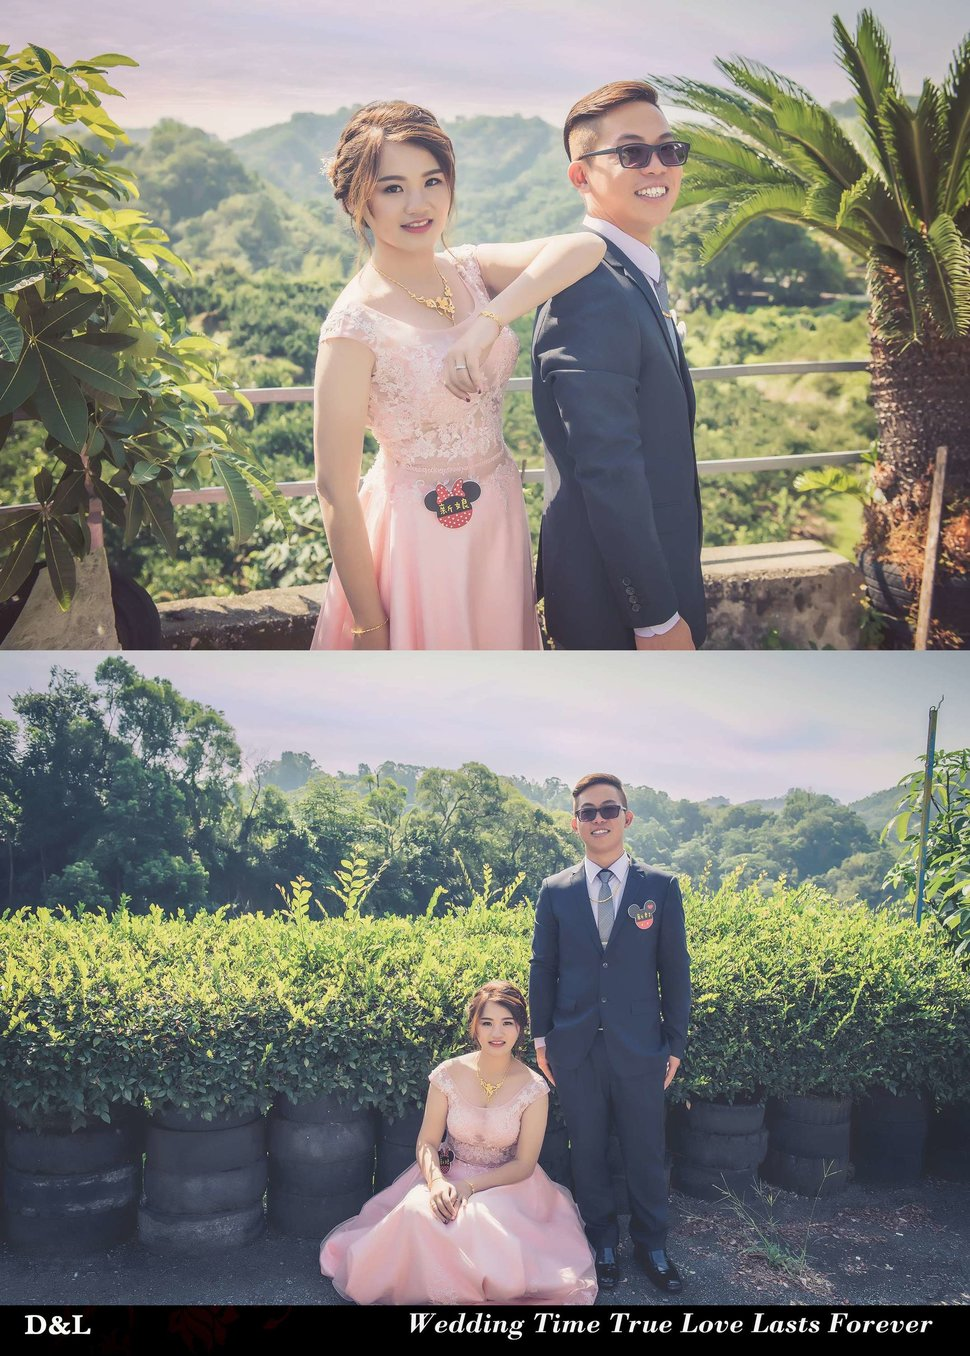 21 - D&L 婚禮事務 · 婚禮婚紗攝影 - 結婚吧